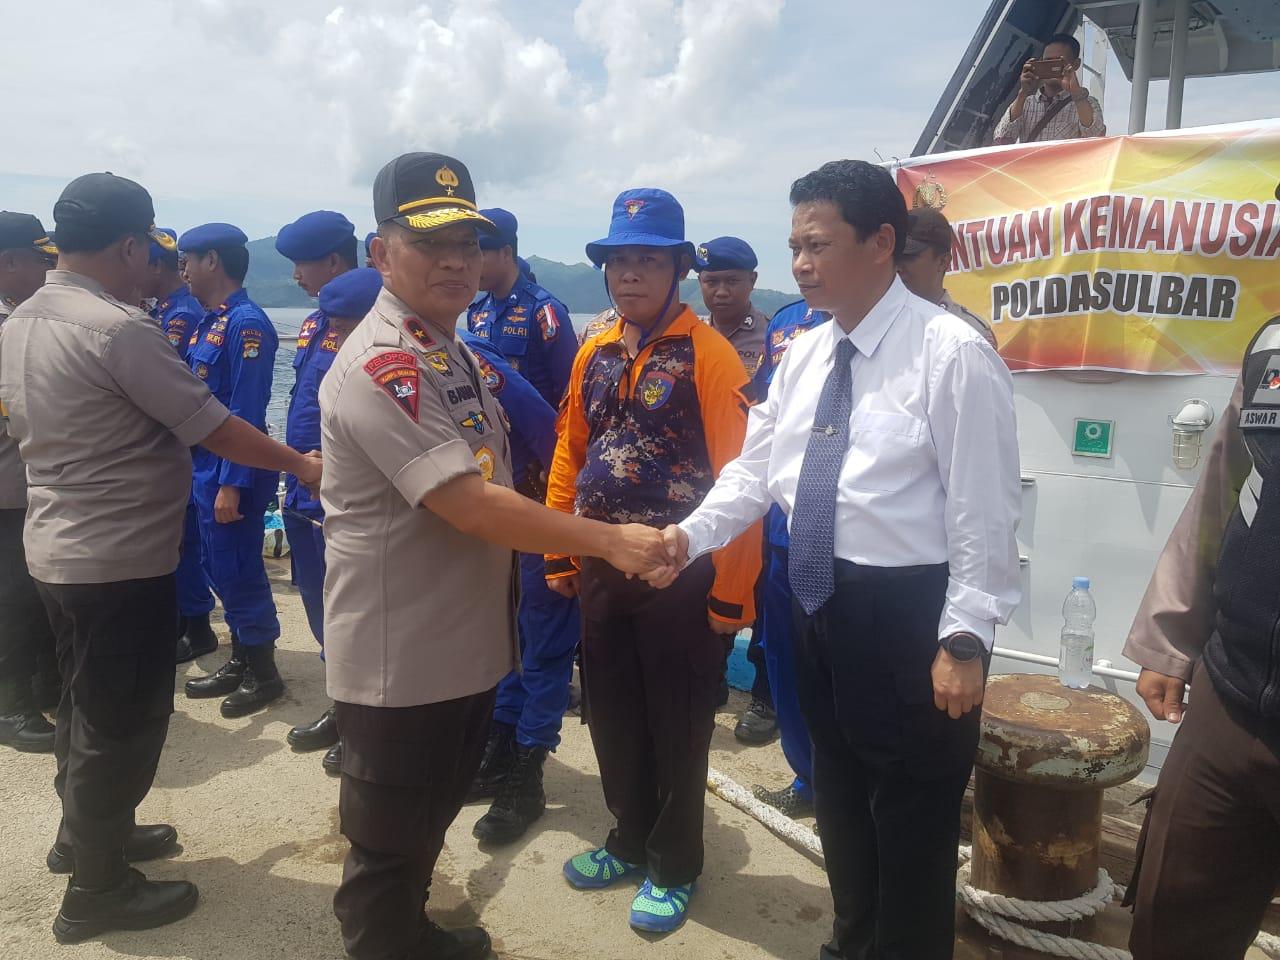 Polda Sulbar, Institusi Pertama Menyalurkan Bantuan Kemanusiaan ke Pulau Ambo